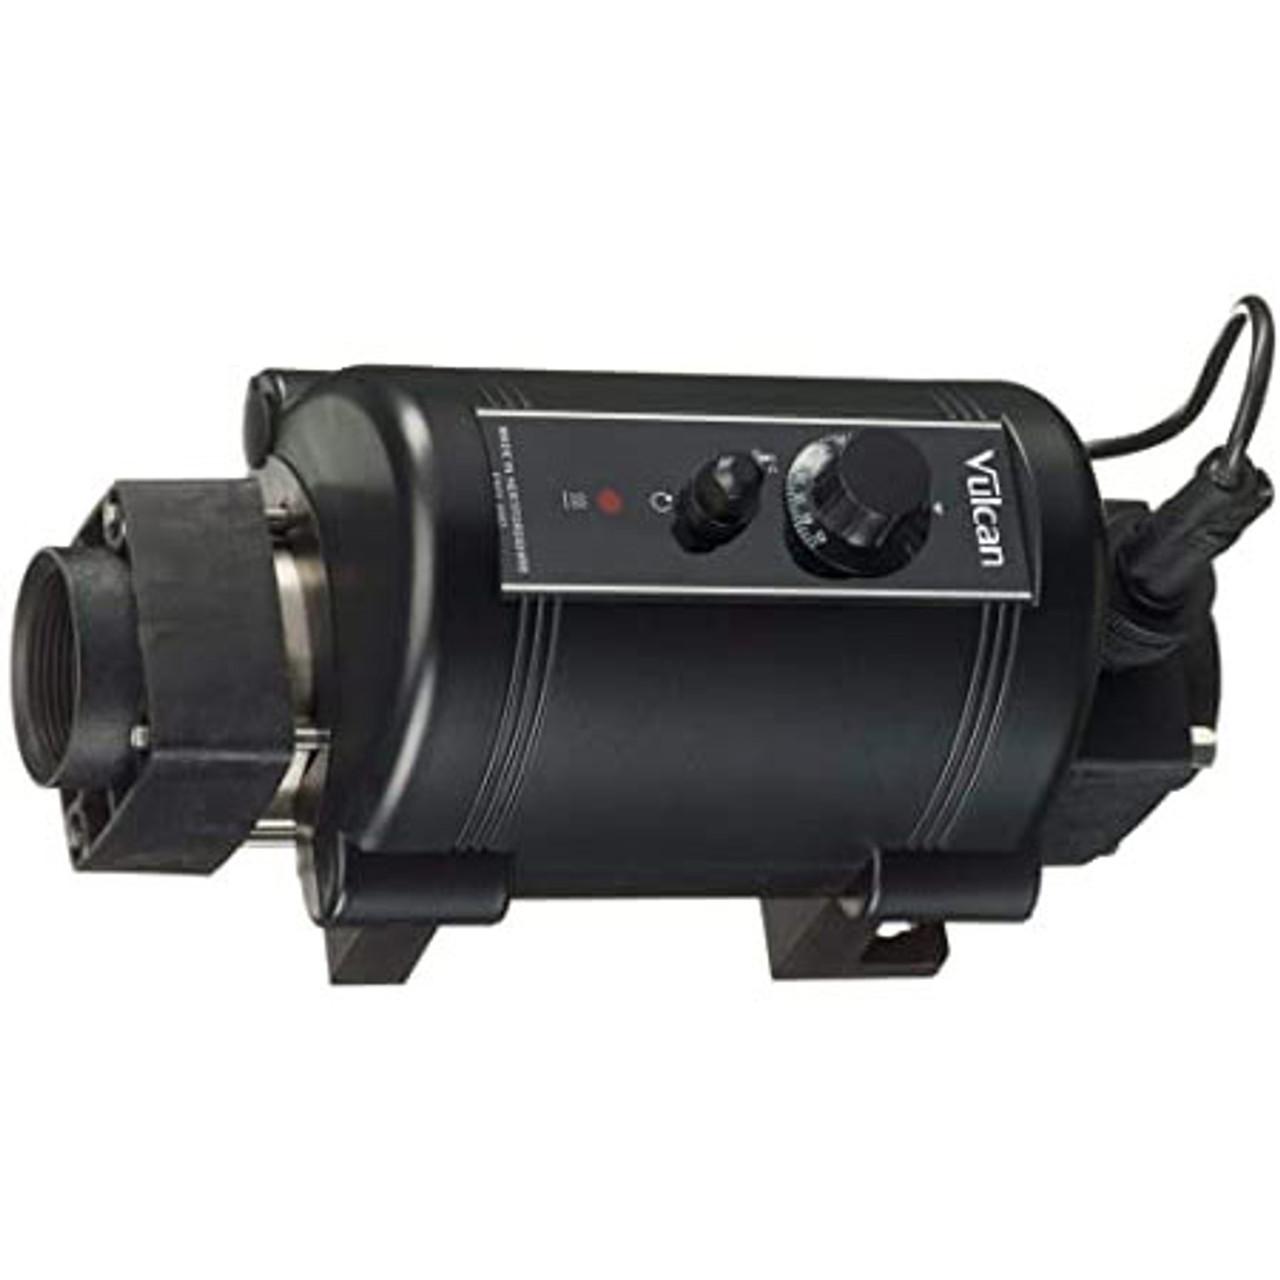 3 kW Elecro Electric Plug & Play Nano Pool Heater - Full Titanium